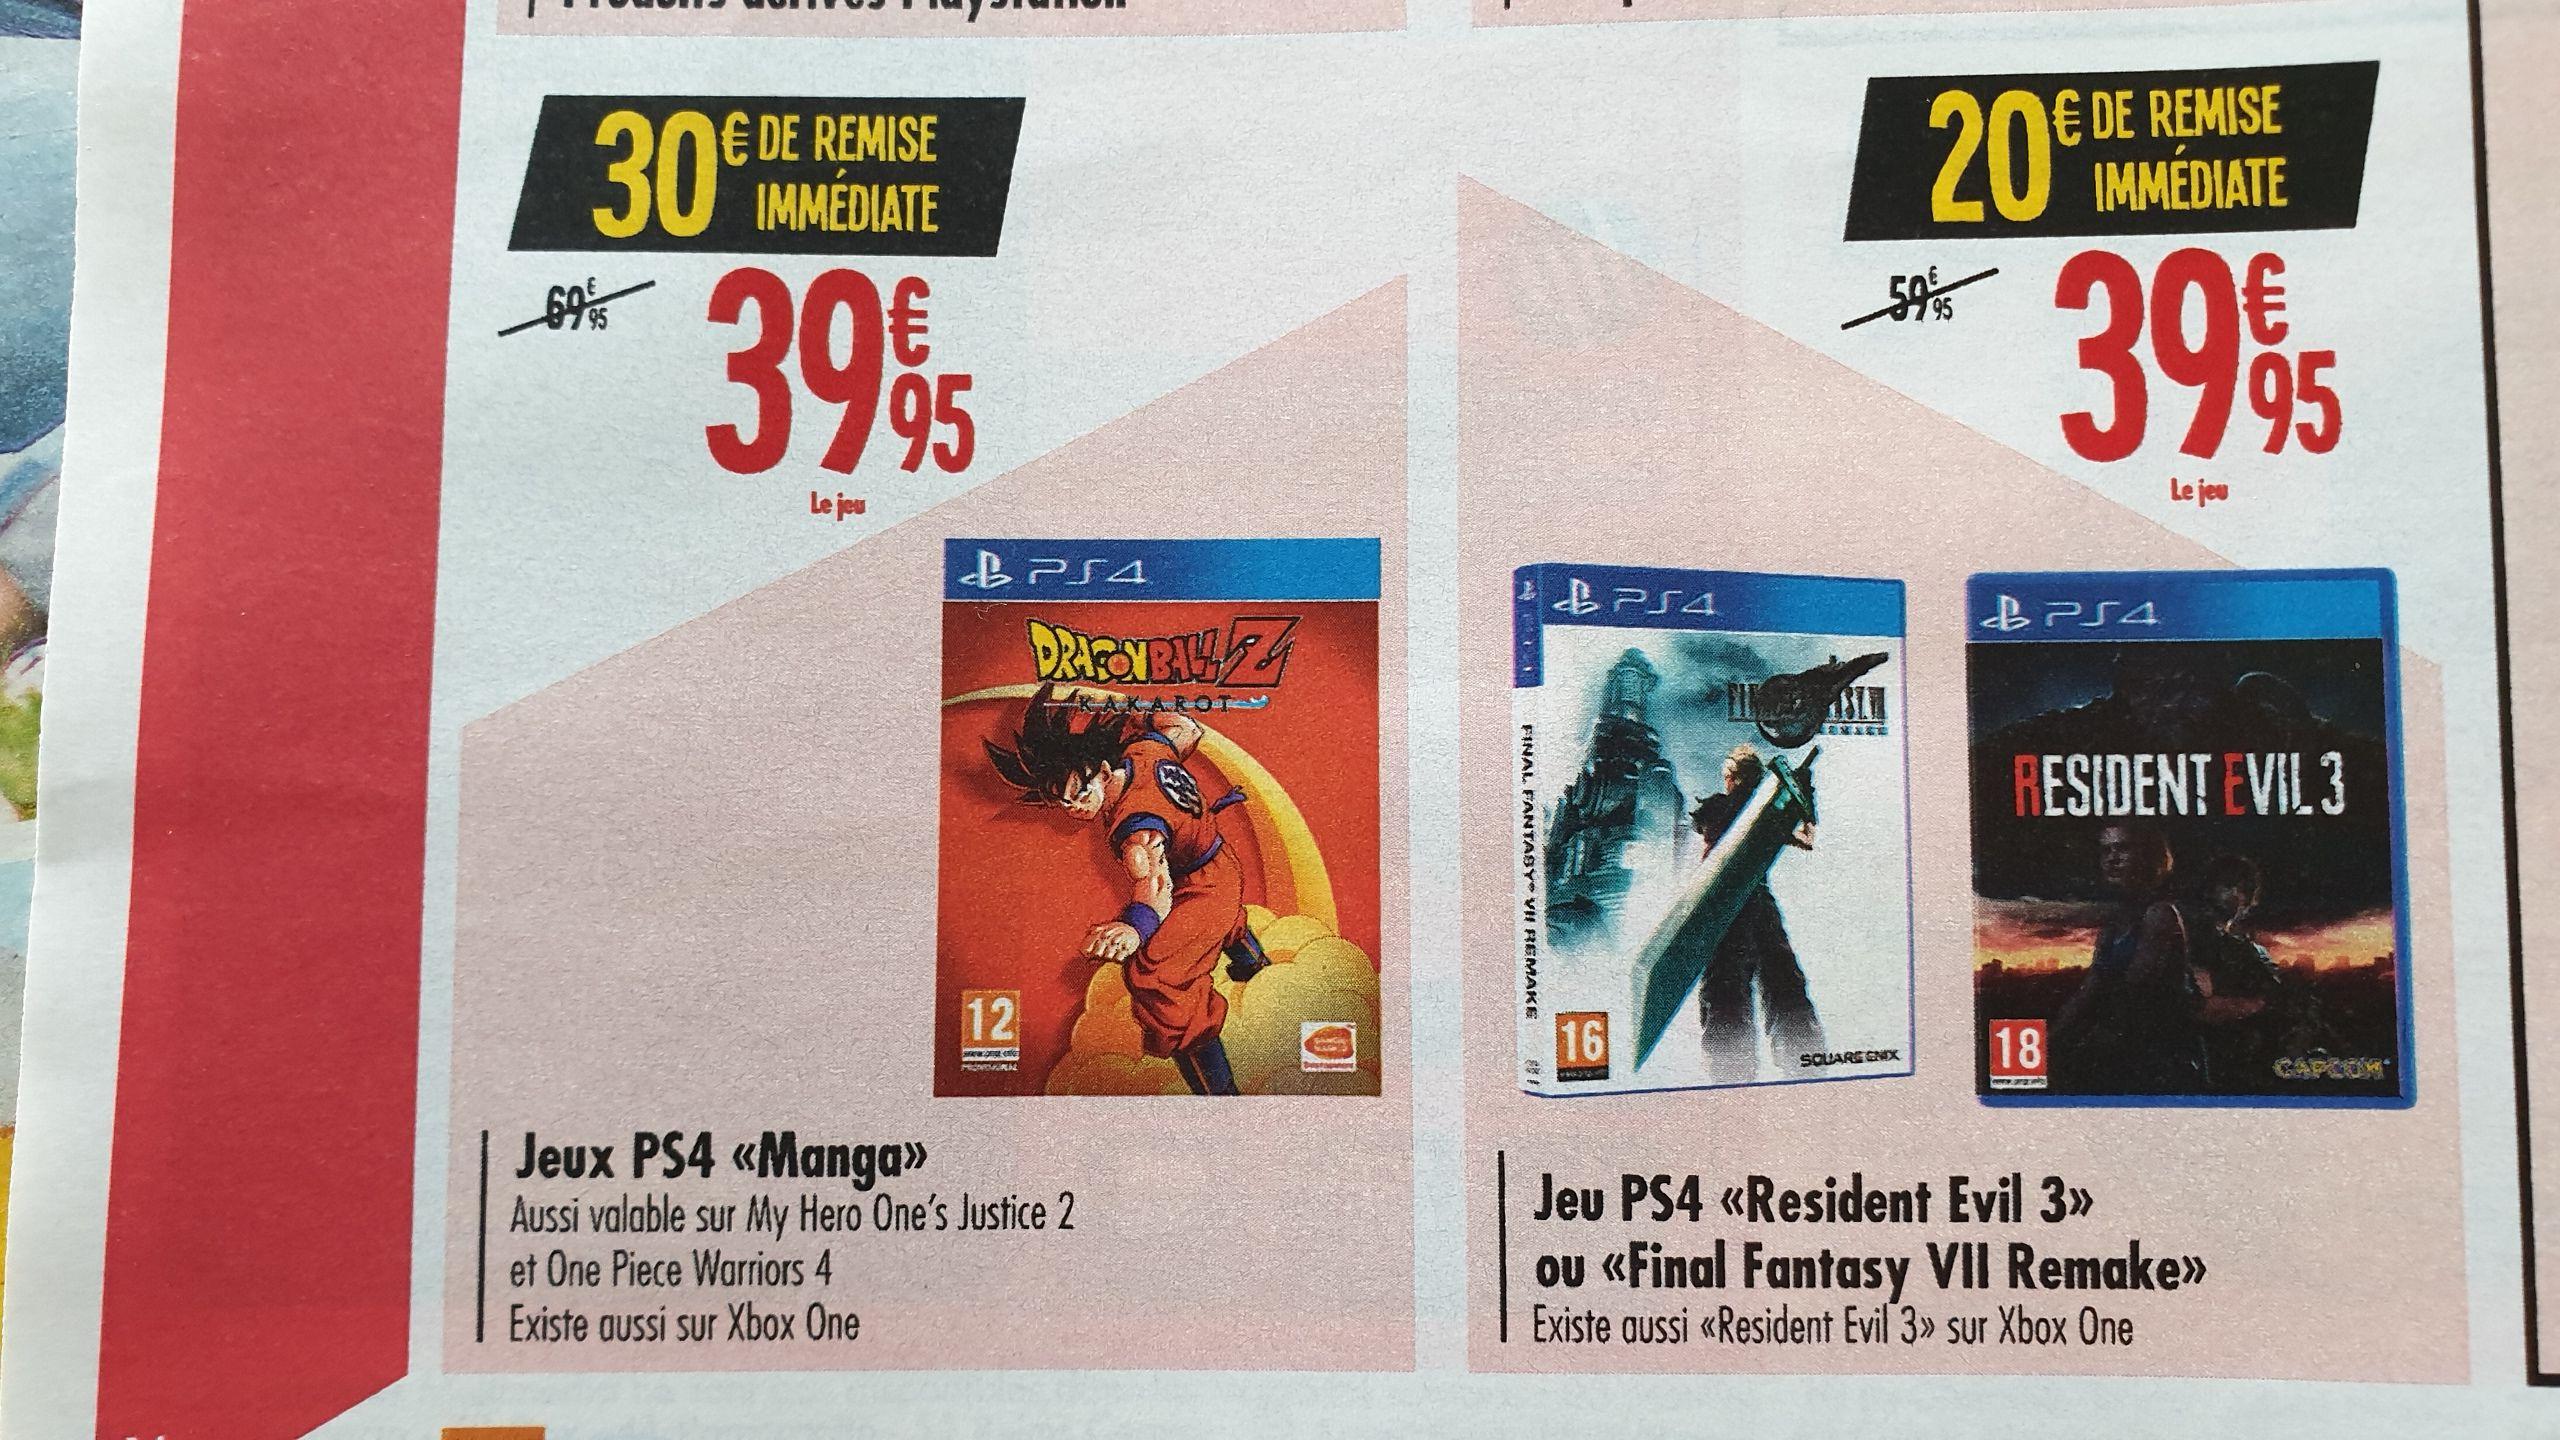 Sélection de Jeux PS4 / Xbox One à 39,95€ - Ex: Dragon Ball Z Kakarot